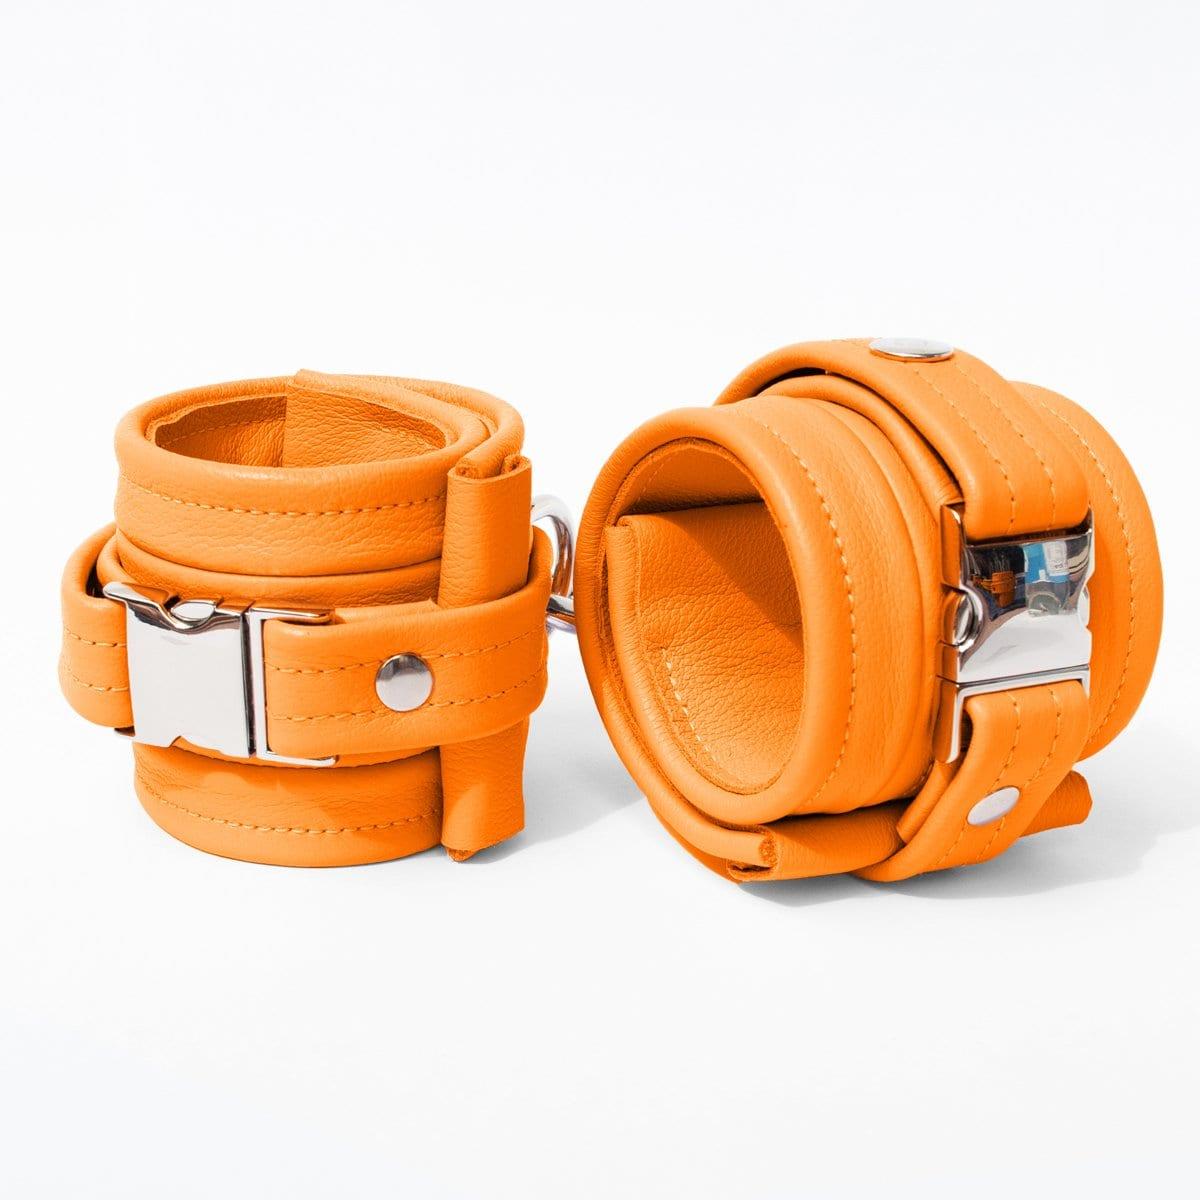 One Size Wrist Restraint Set - Standard Leather - Orange - Silver Metal Fittings